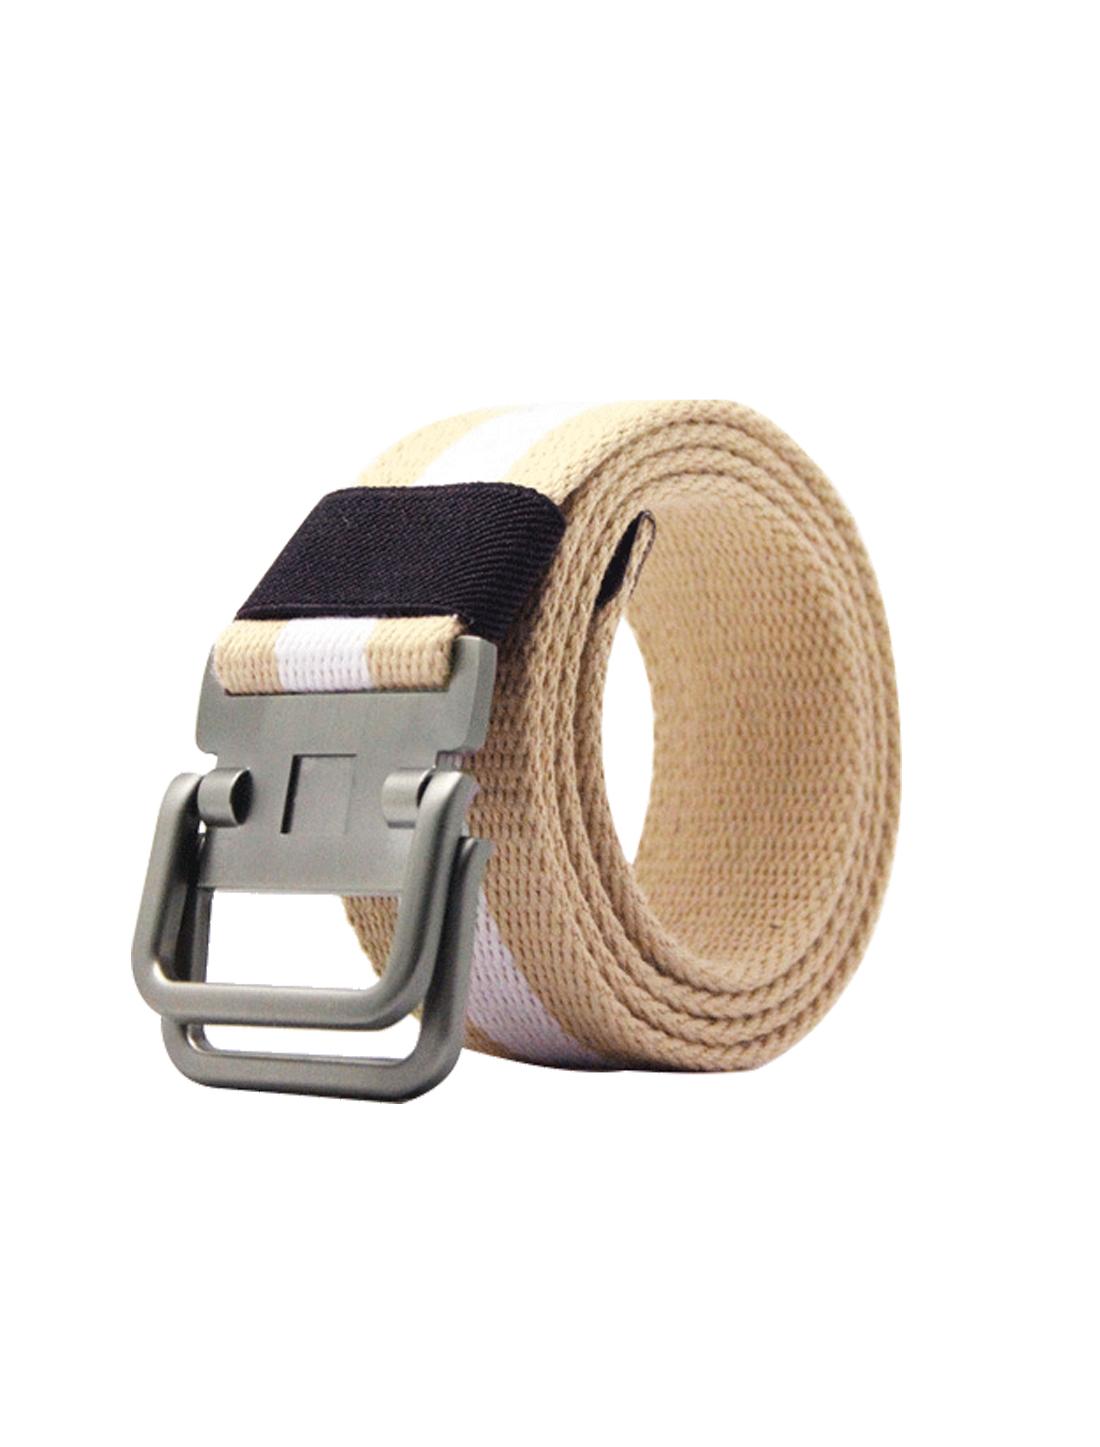 Unisex Canvas Double Ring Adjustable Holeless Metal Buckle Stripe Belt Khaki